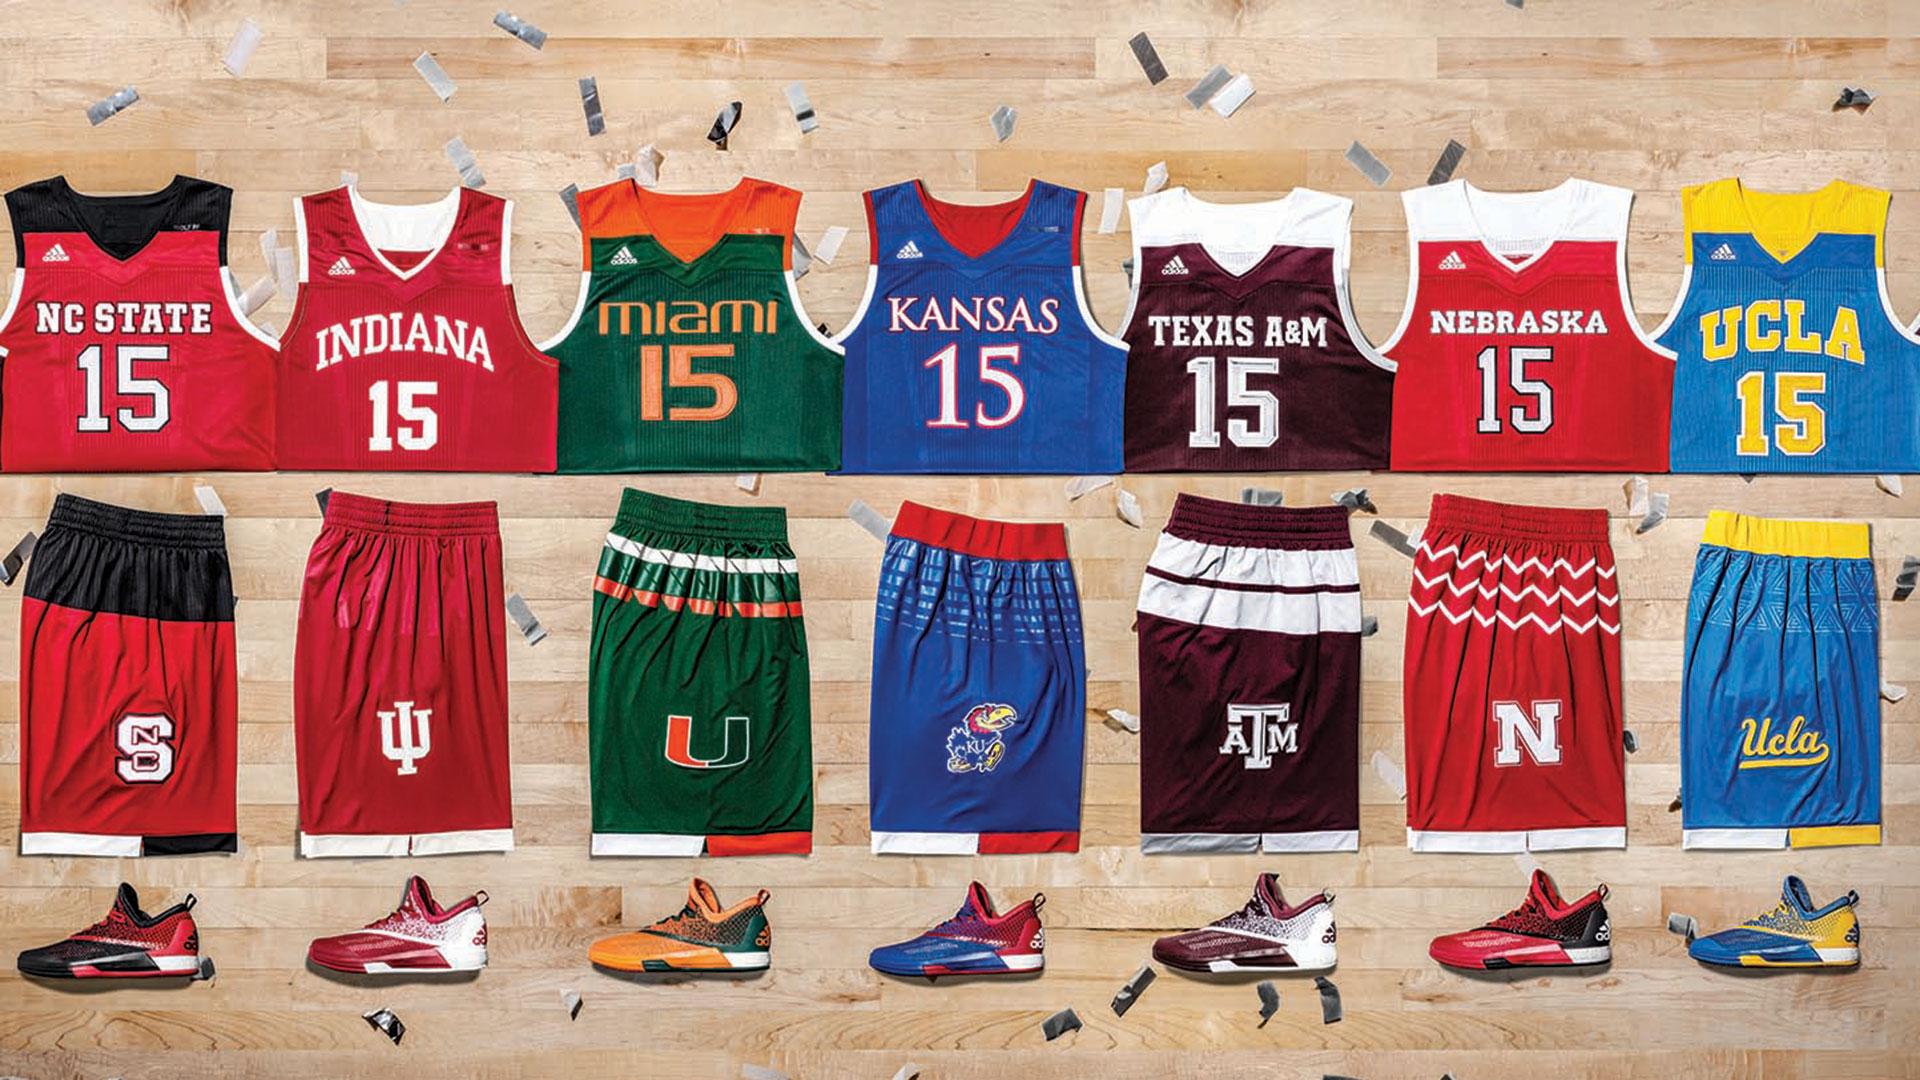 adidas unveils 'School Pride' basketball uniforms for 2016 NCAA ...